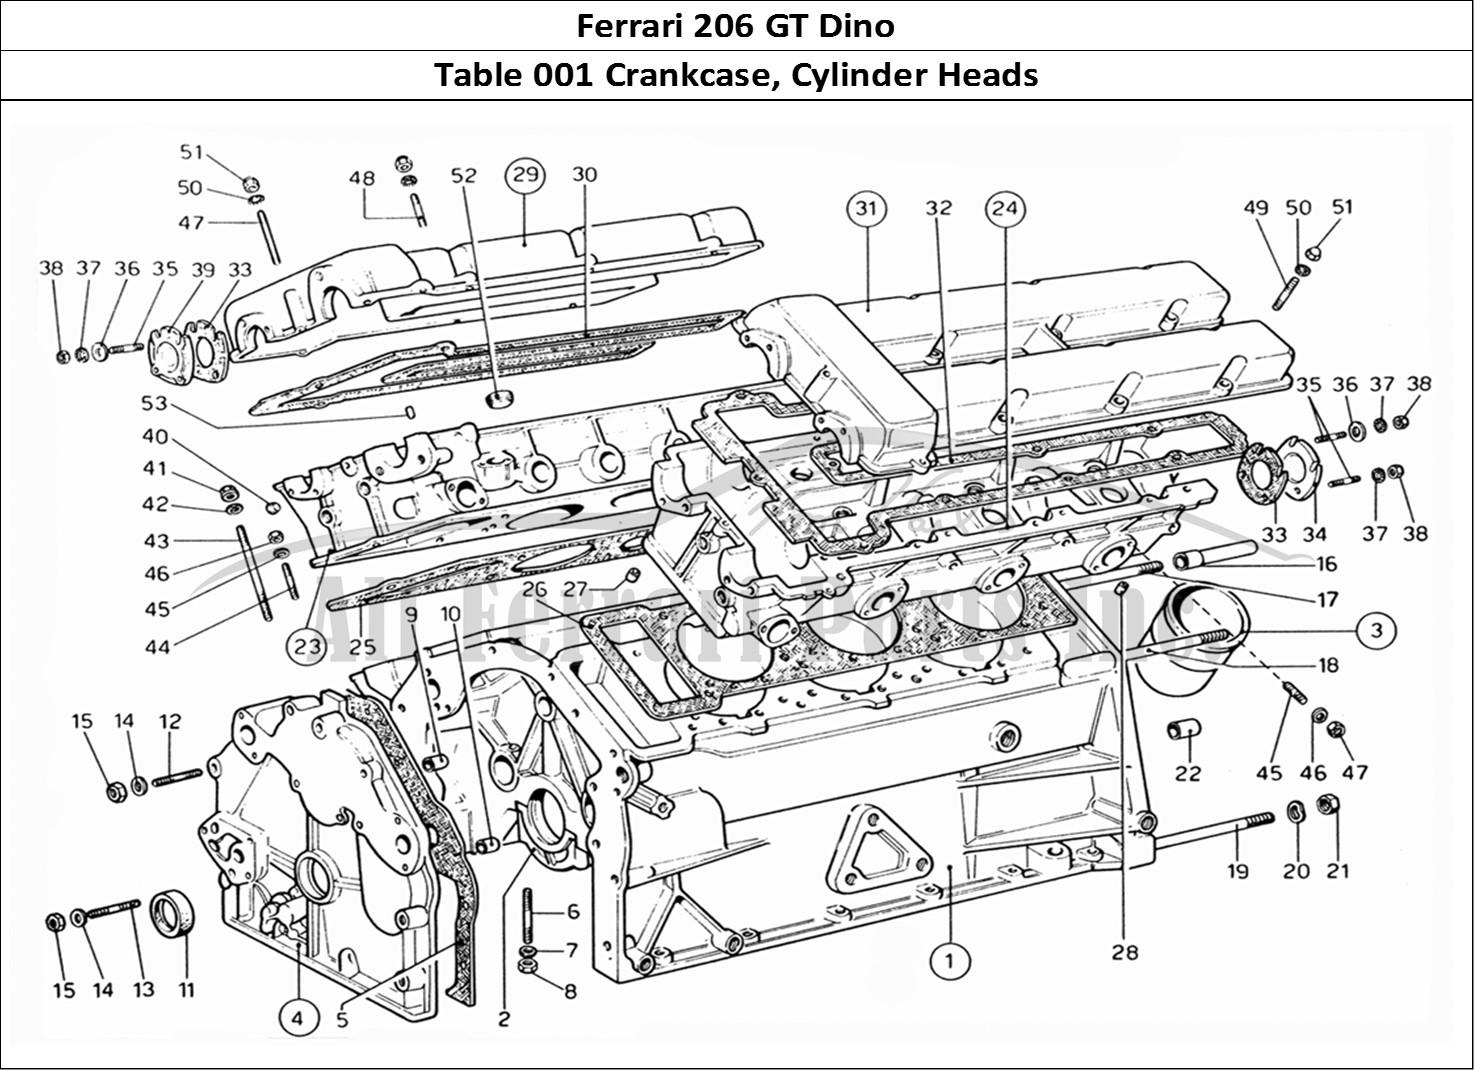 Ferrari 206 GT Dino Mechanical Table 001 Crankcase, Cylinder Heads